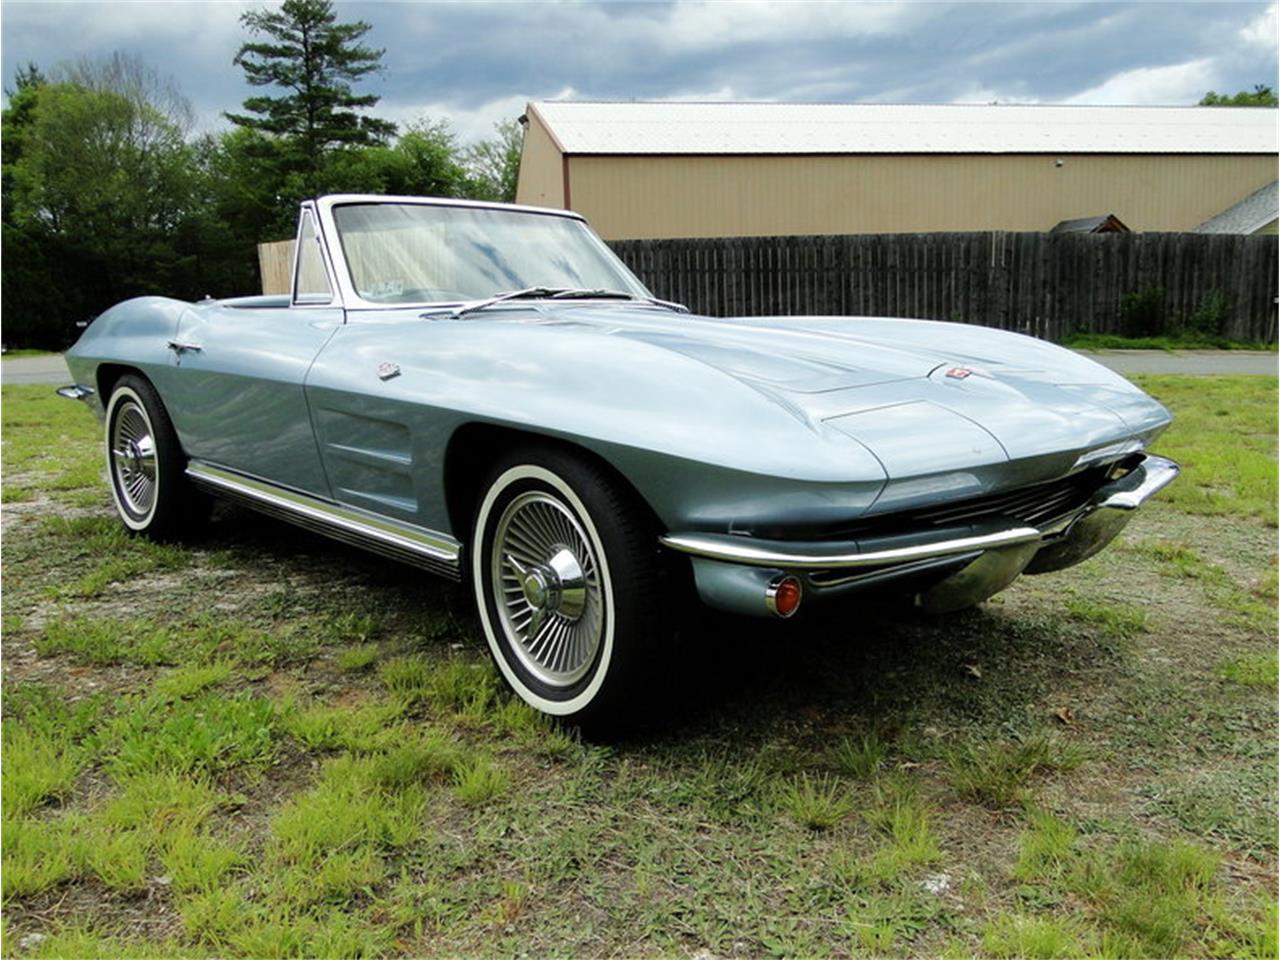 Large Picture of Classic '64 Chevrolet Corvette - $39,990.00 - LDZM